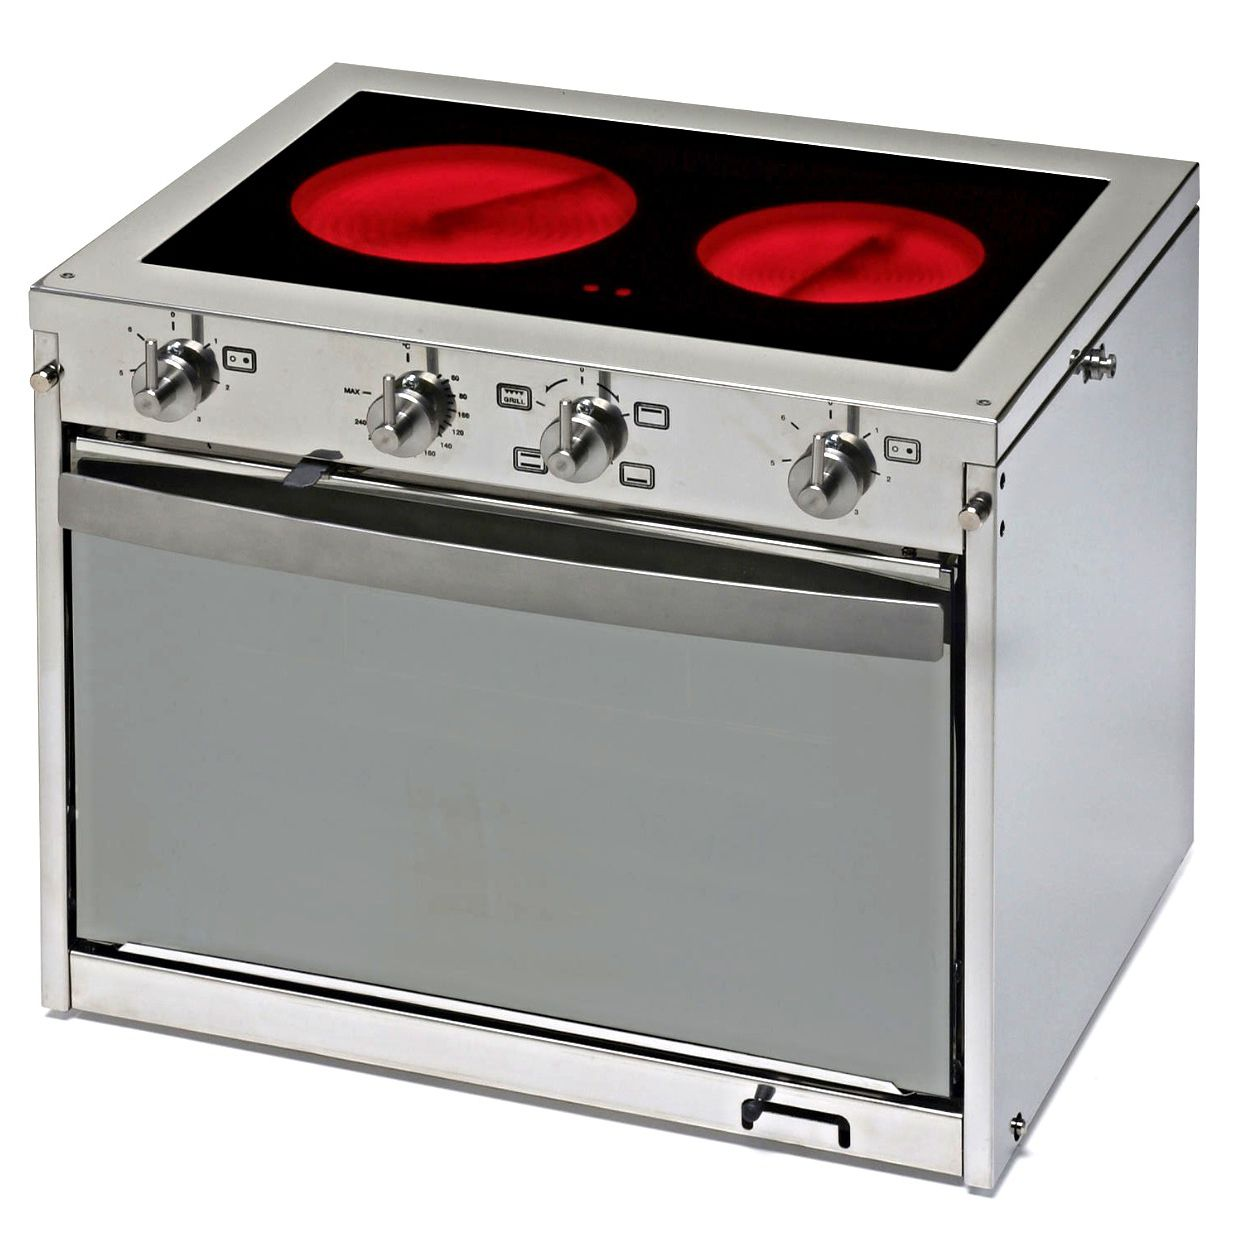 Boat Stove Oven / Electric / Two Burner   HORIZON2